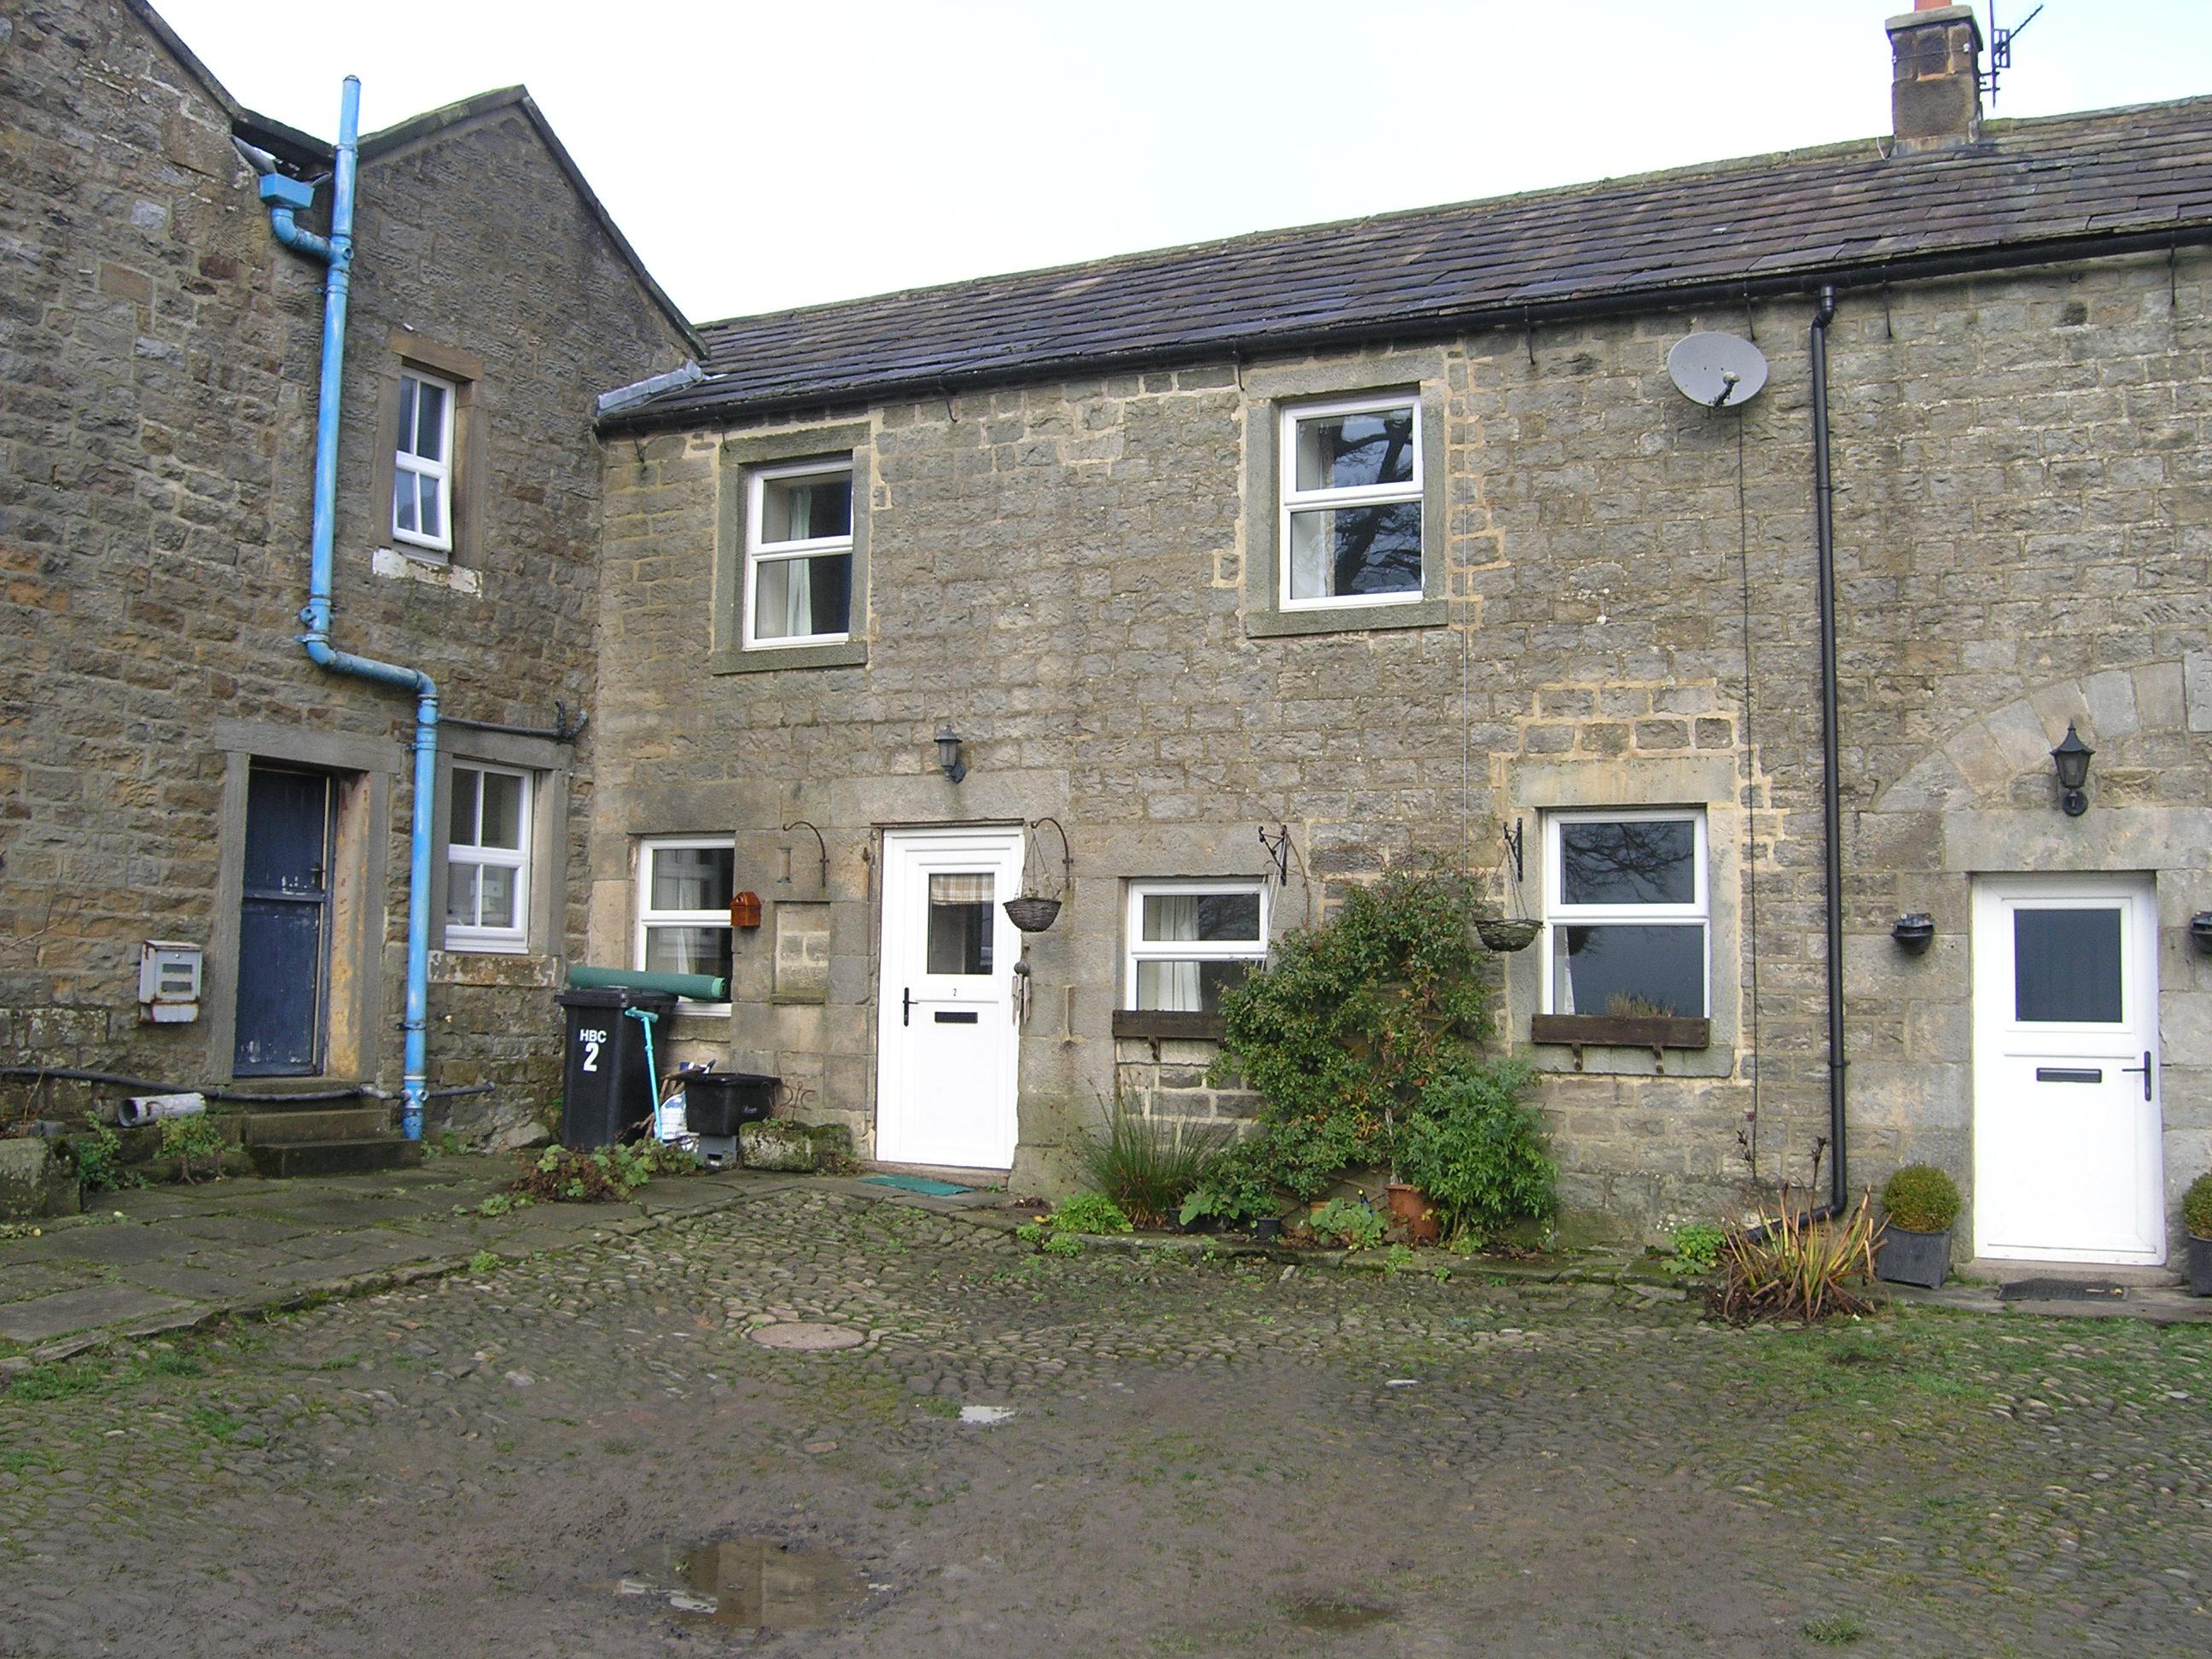 2 Dovenor Cottages, Middlesmoor